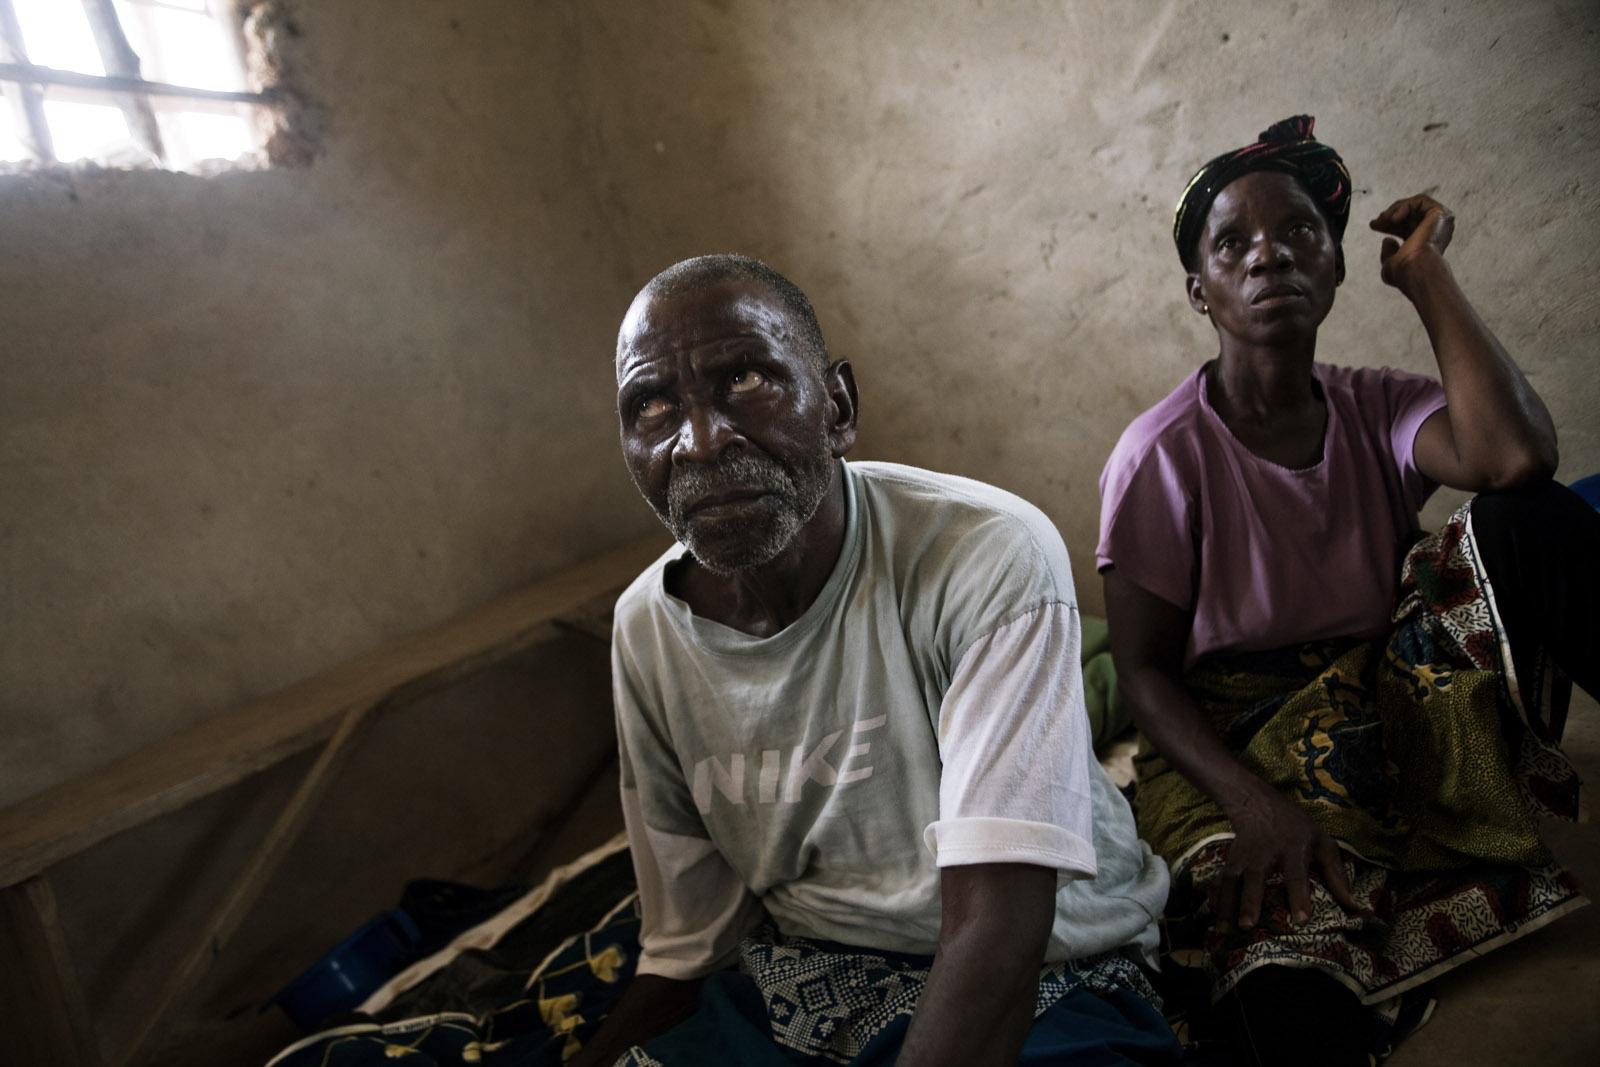 liberia-refugies-ivoiriens-0311-0651hd